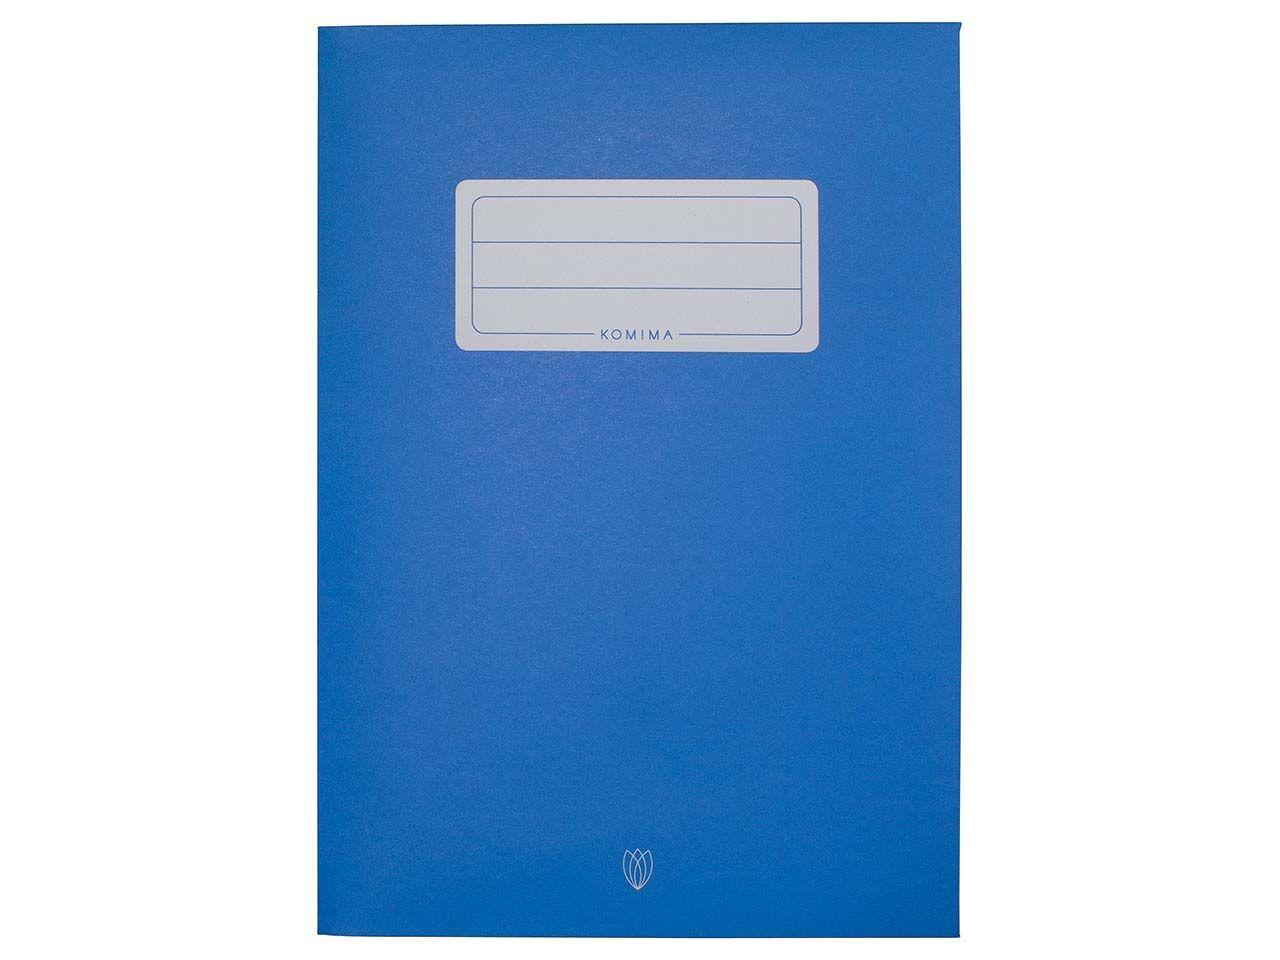 Komima Heftumschlag aus Recyclingpapier, dunkelblau DIN A5 DIN A5 dunkelblau